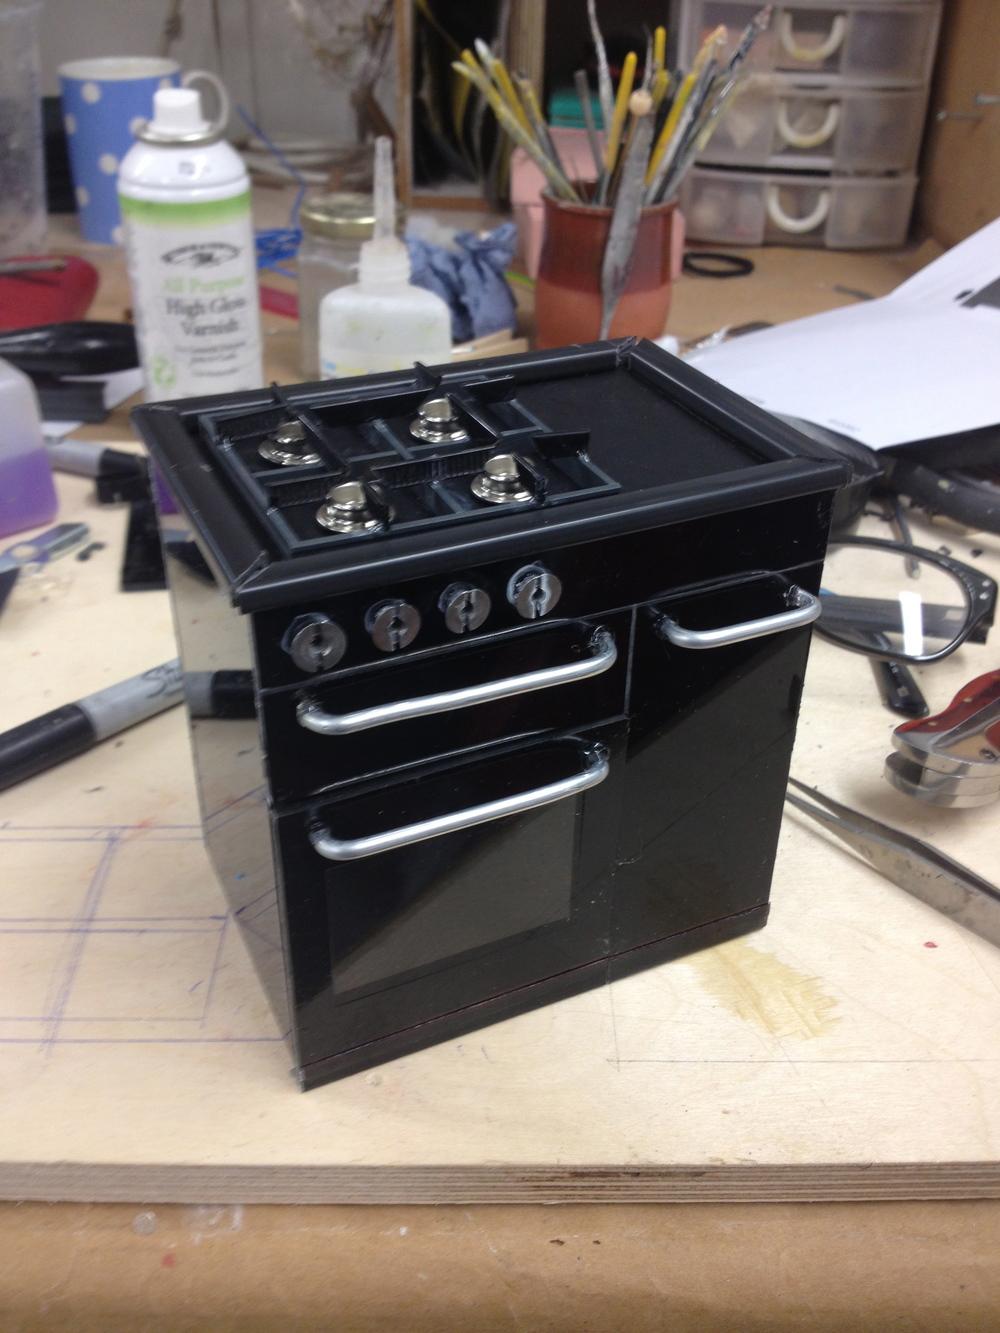 Miniature oven model